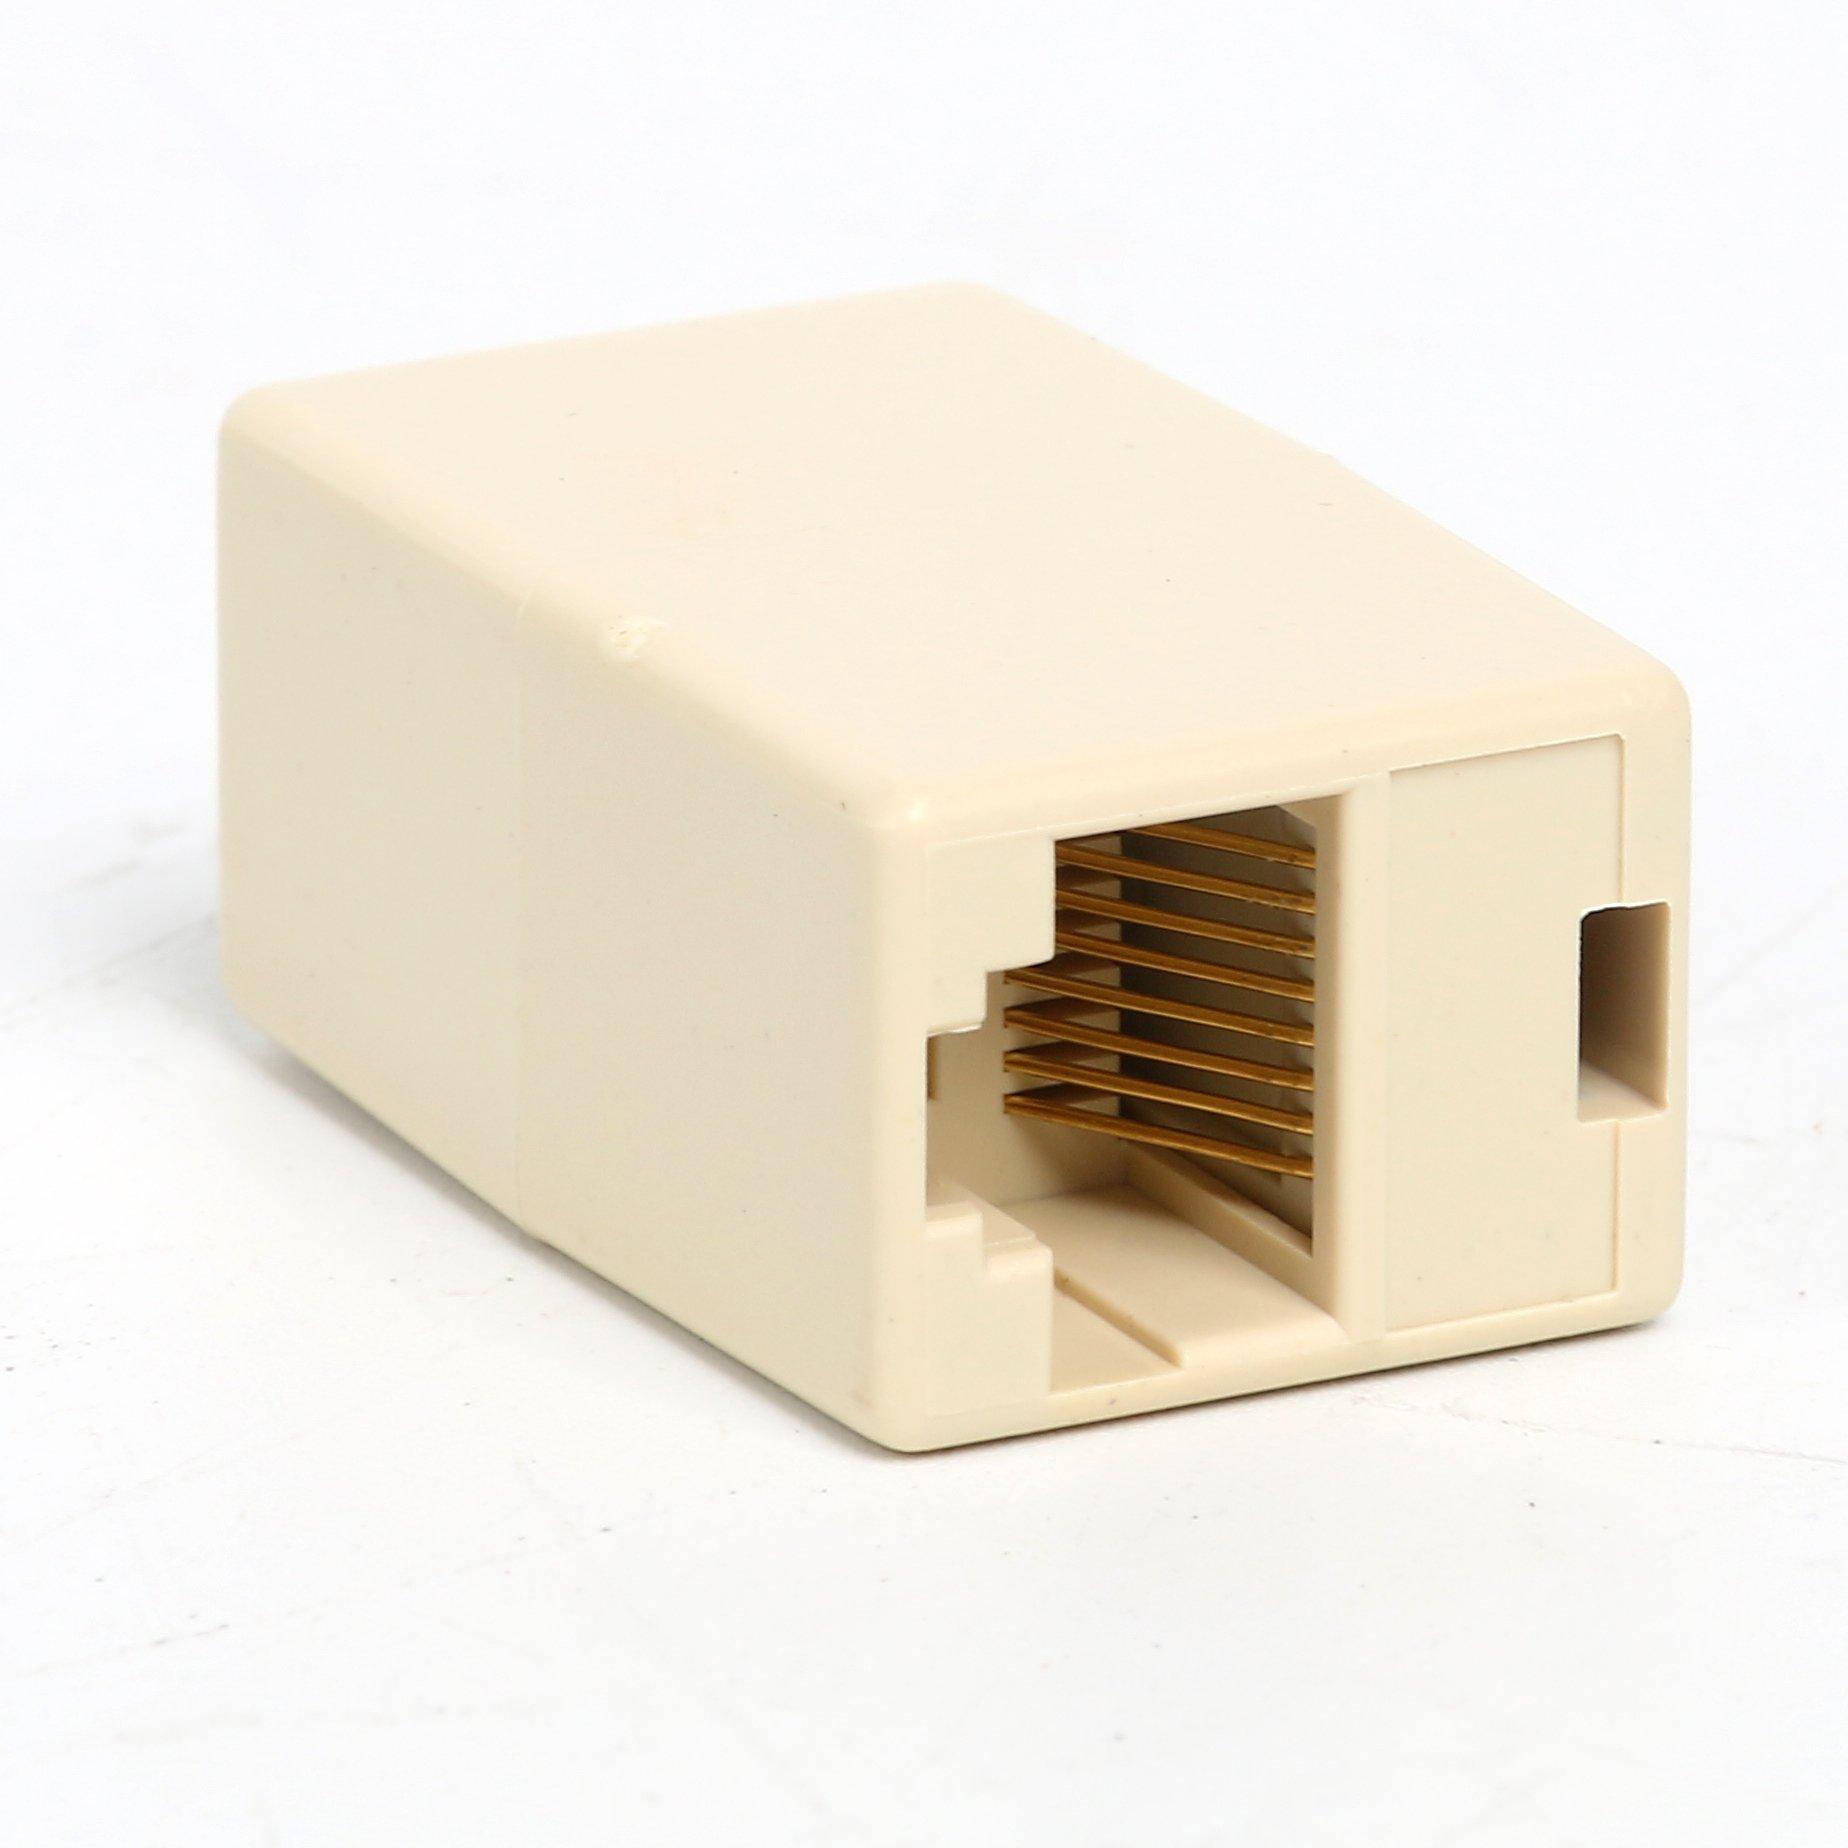 Yaetek Portable Ethernet Network Tool Cable Tester LAN Kit RJ45 Crimper Plug Crimping tool Set Punch Down RJ11 Cat5 Cat6 Wire Line Detector by YaeTek (Image #8)